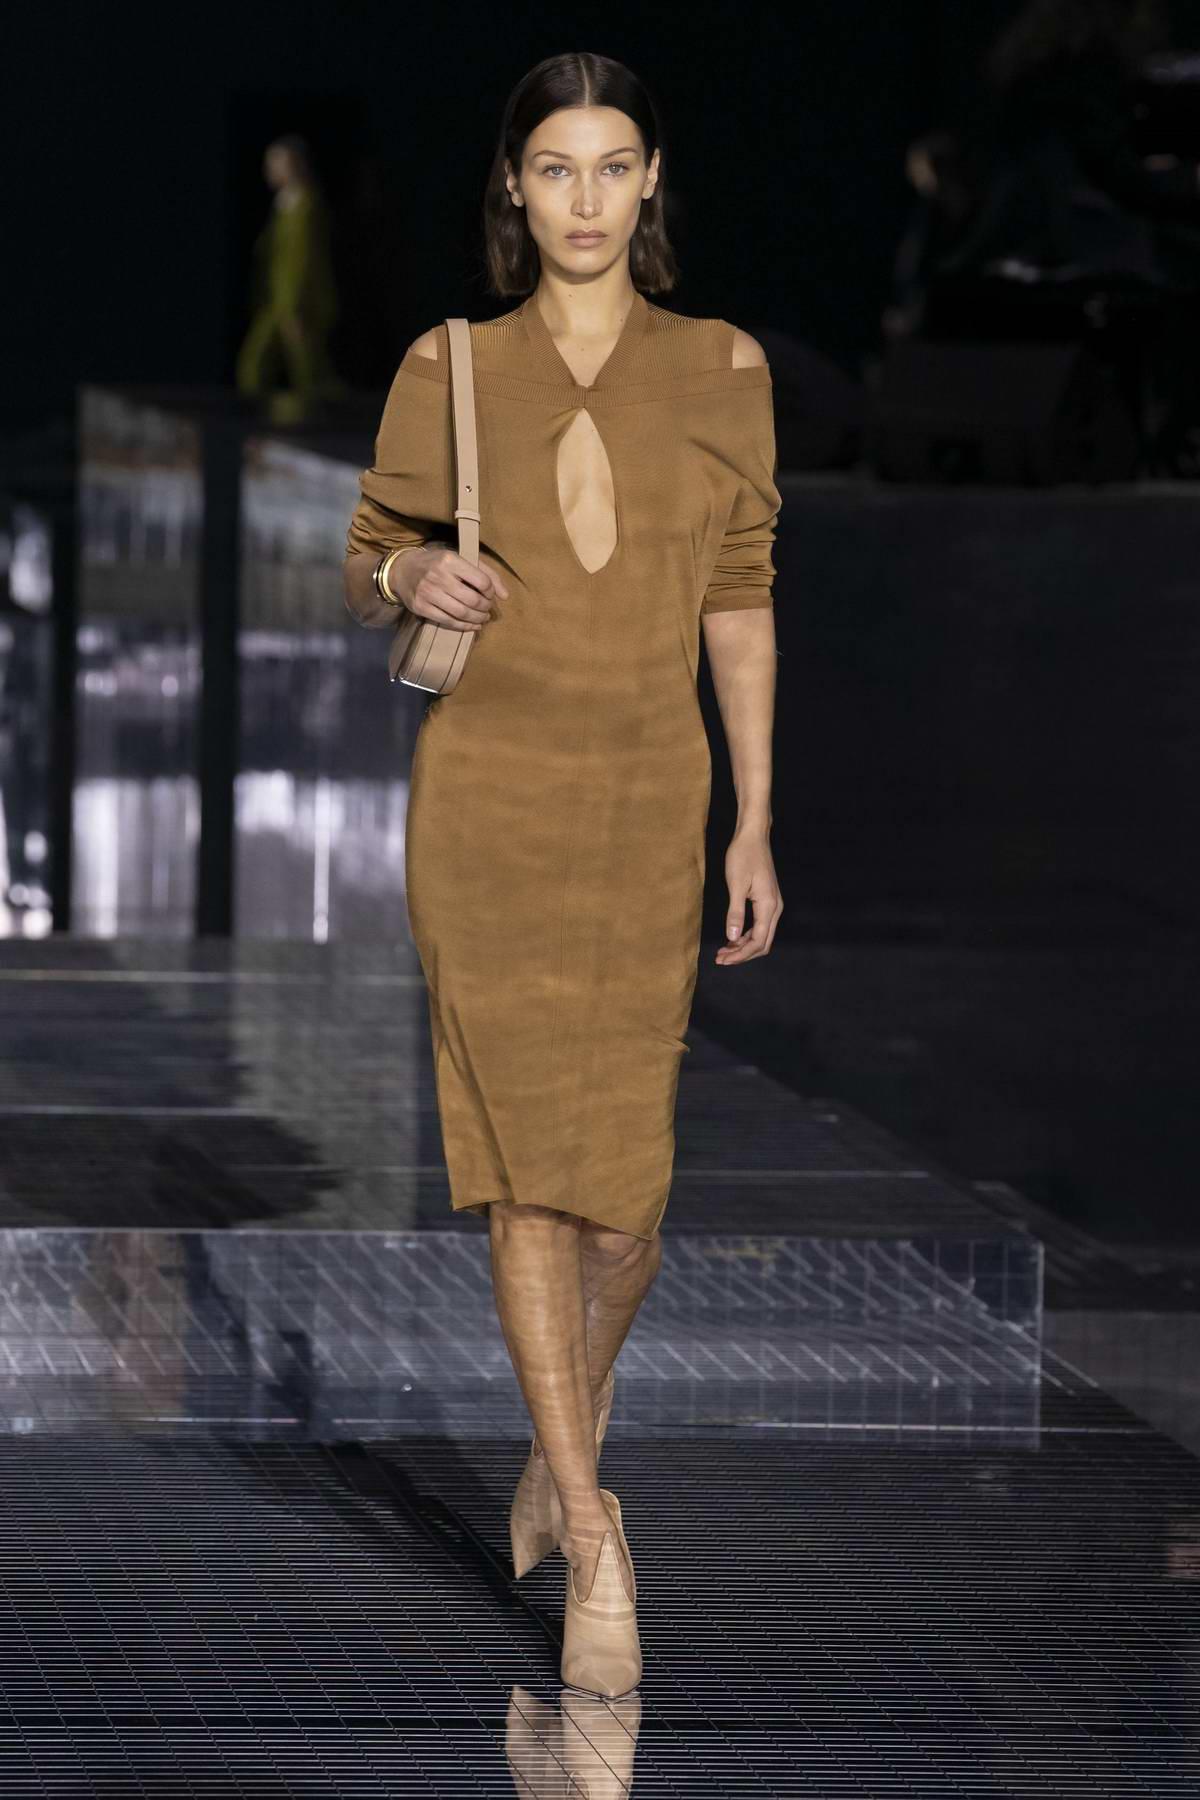 Bella Hadid walks the Burberry AW20 runway during London Fashion Week in London, UK